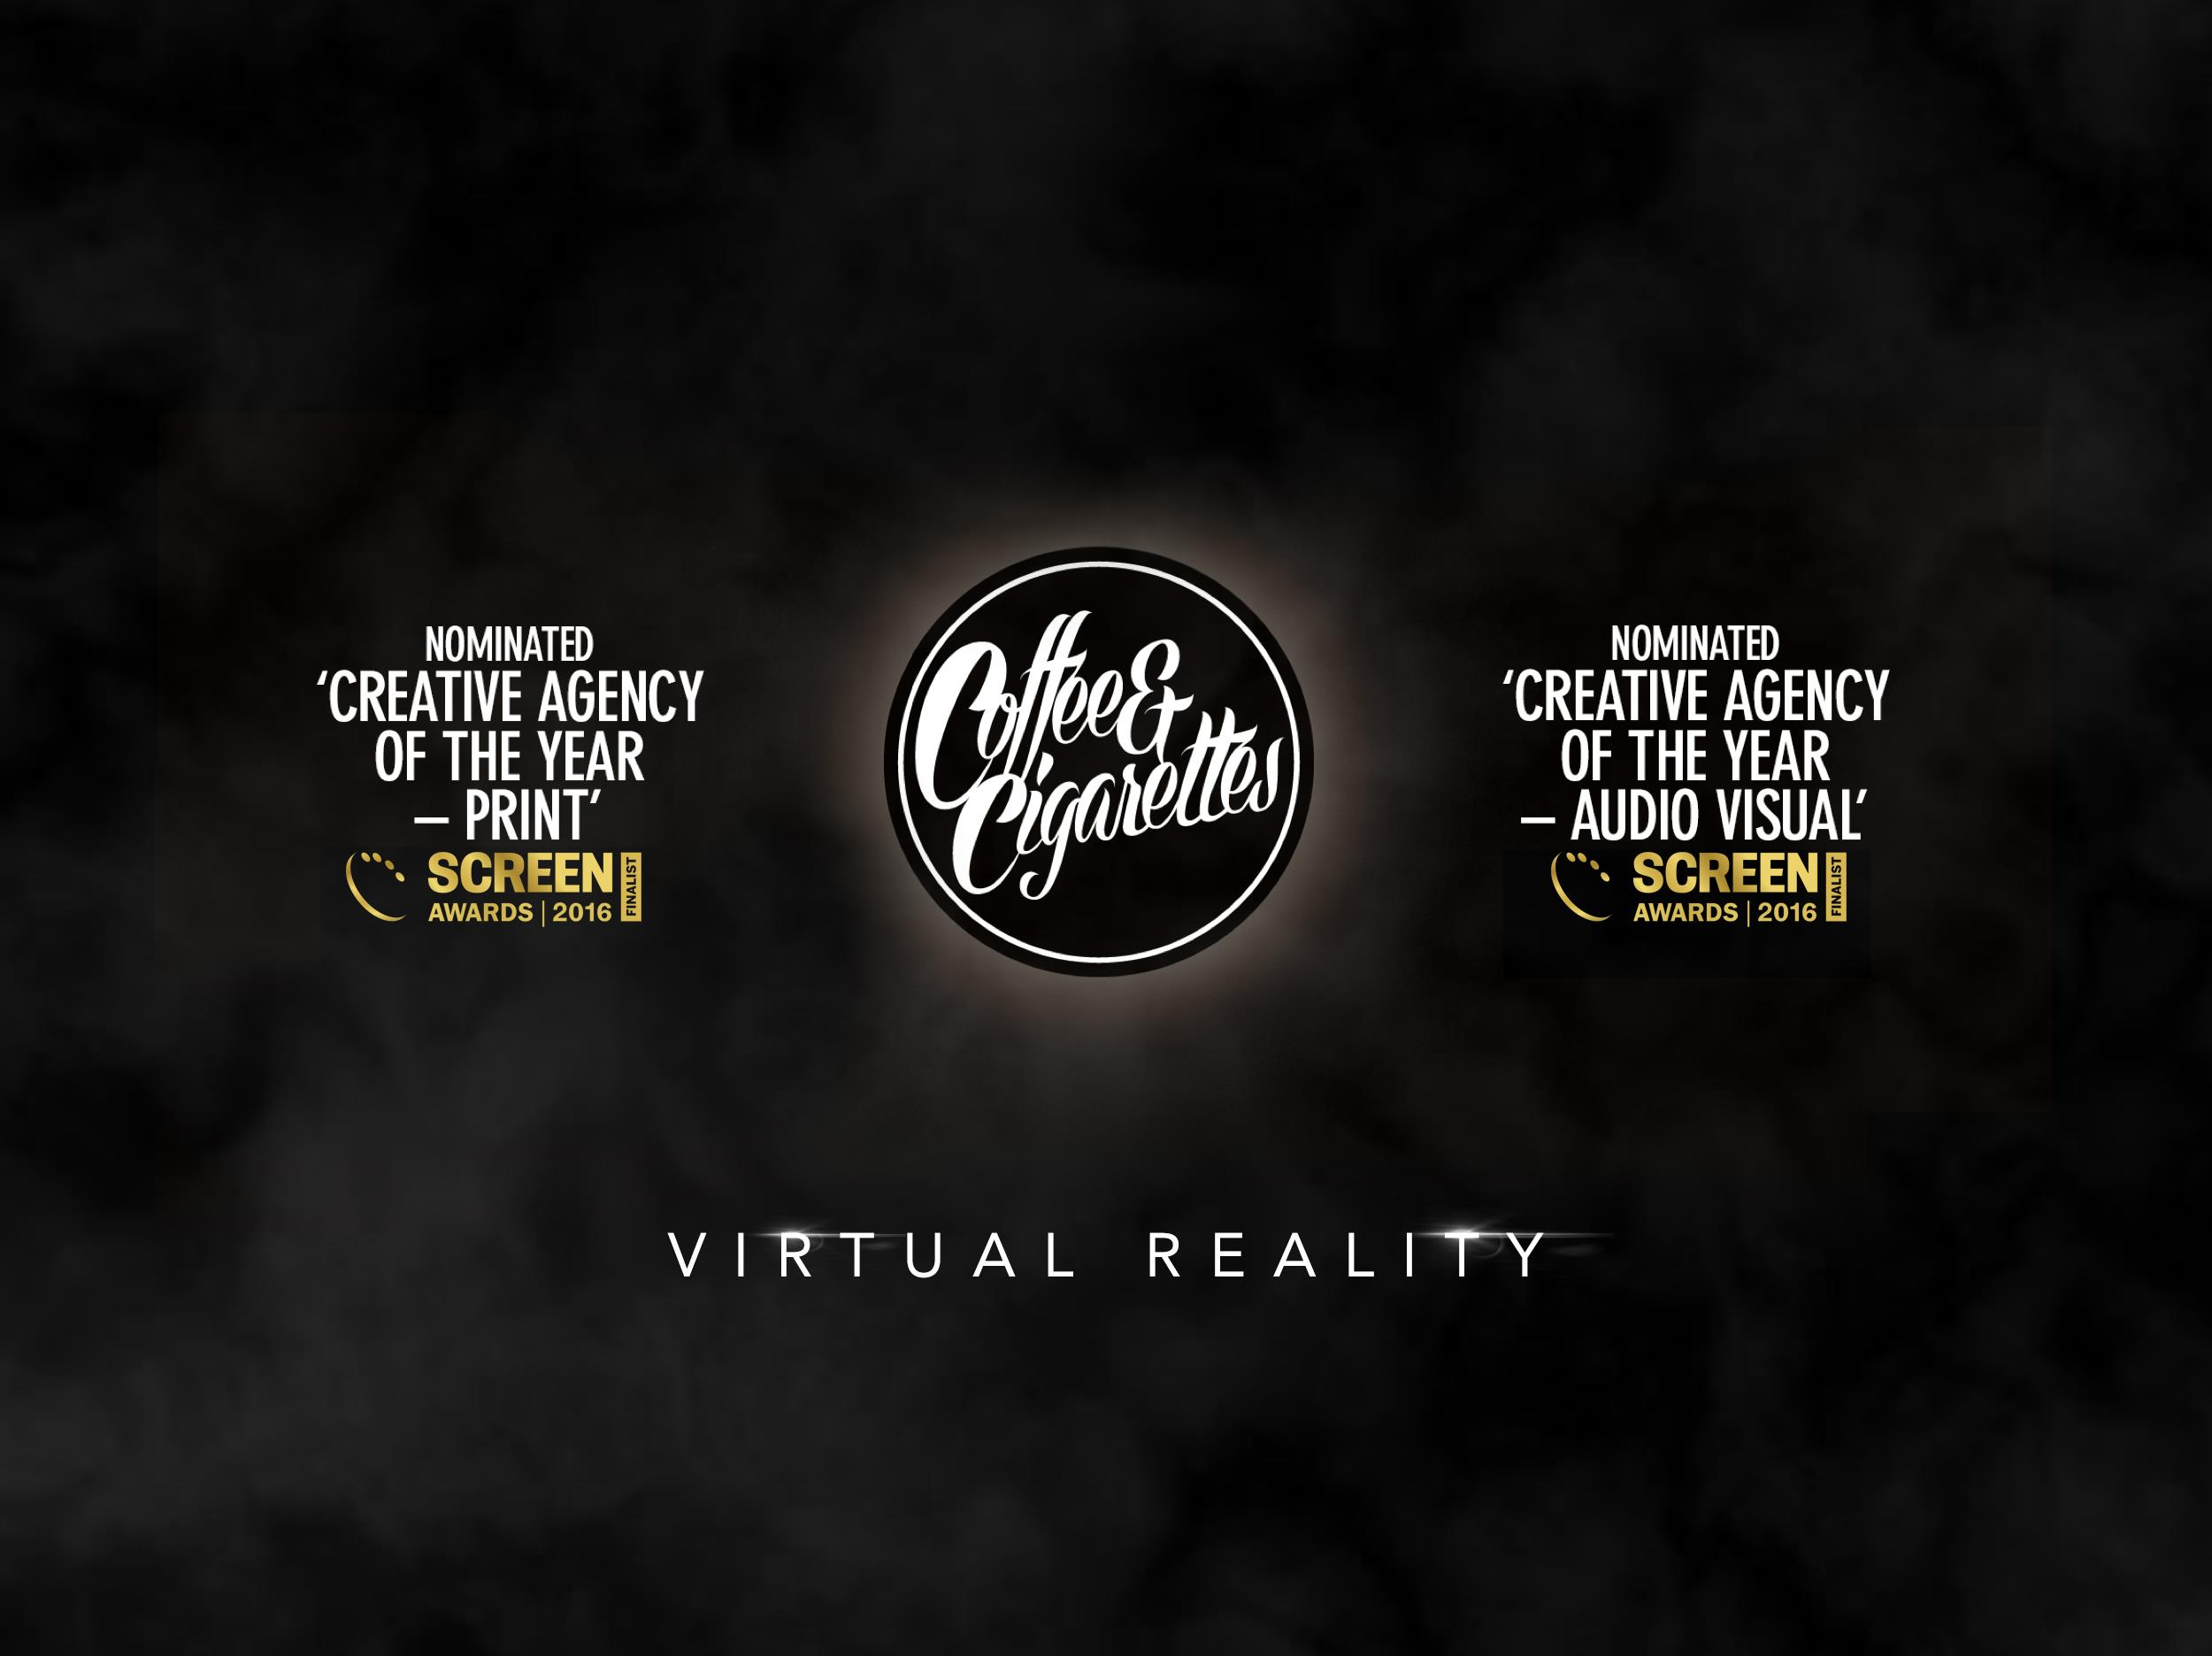 C&C Virtual Reality